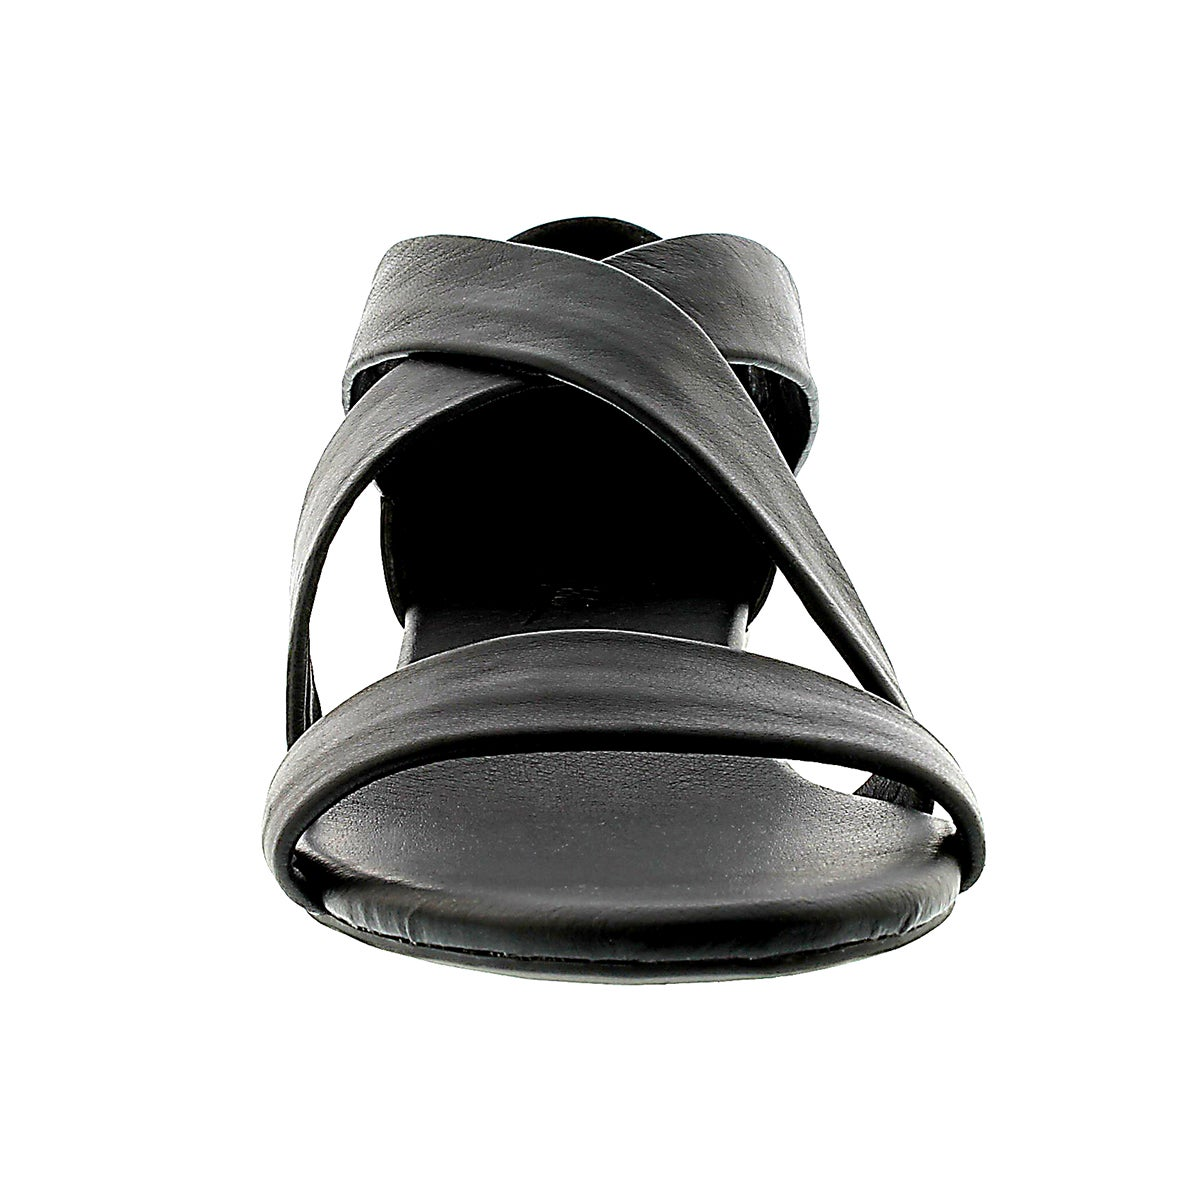 Lds Emilia black leather sandal